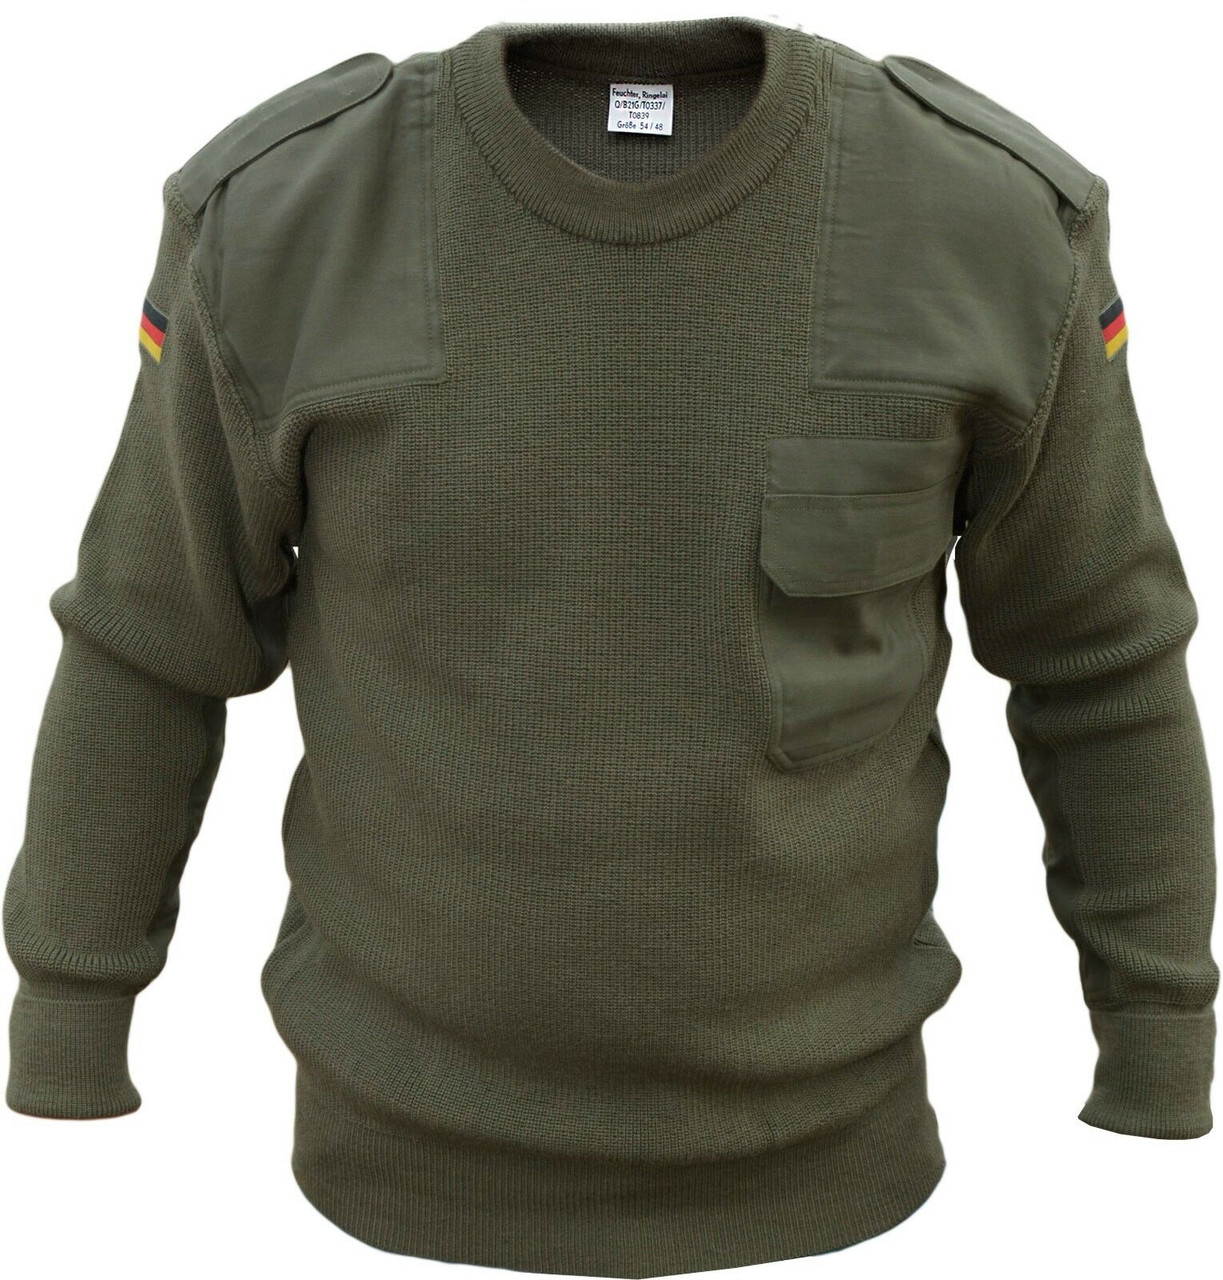 Bw Commando Sweater